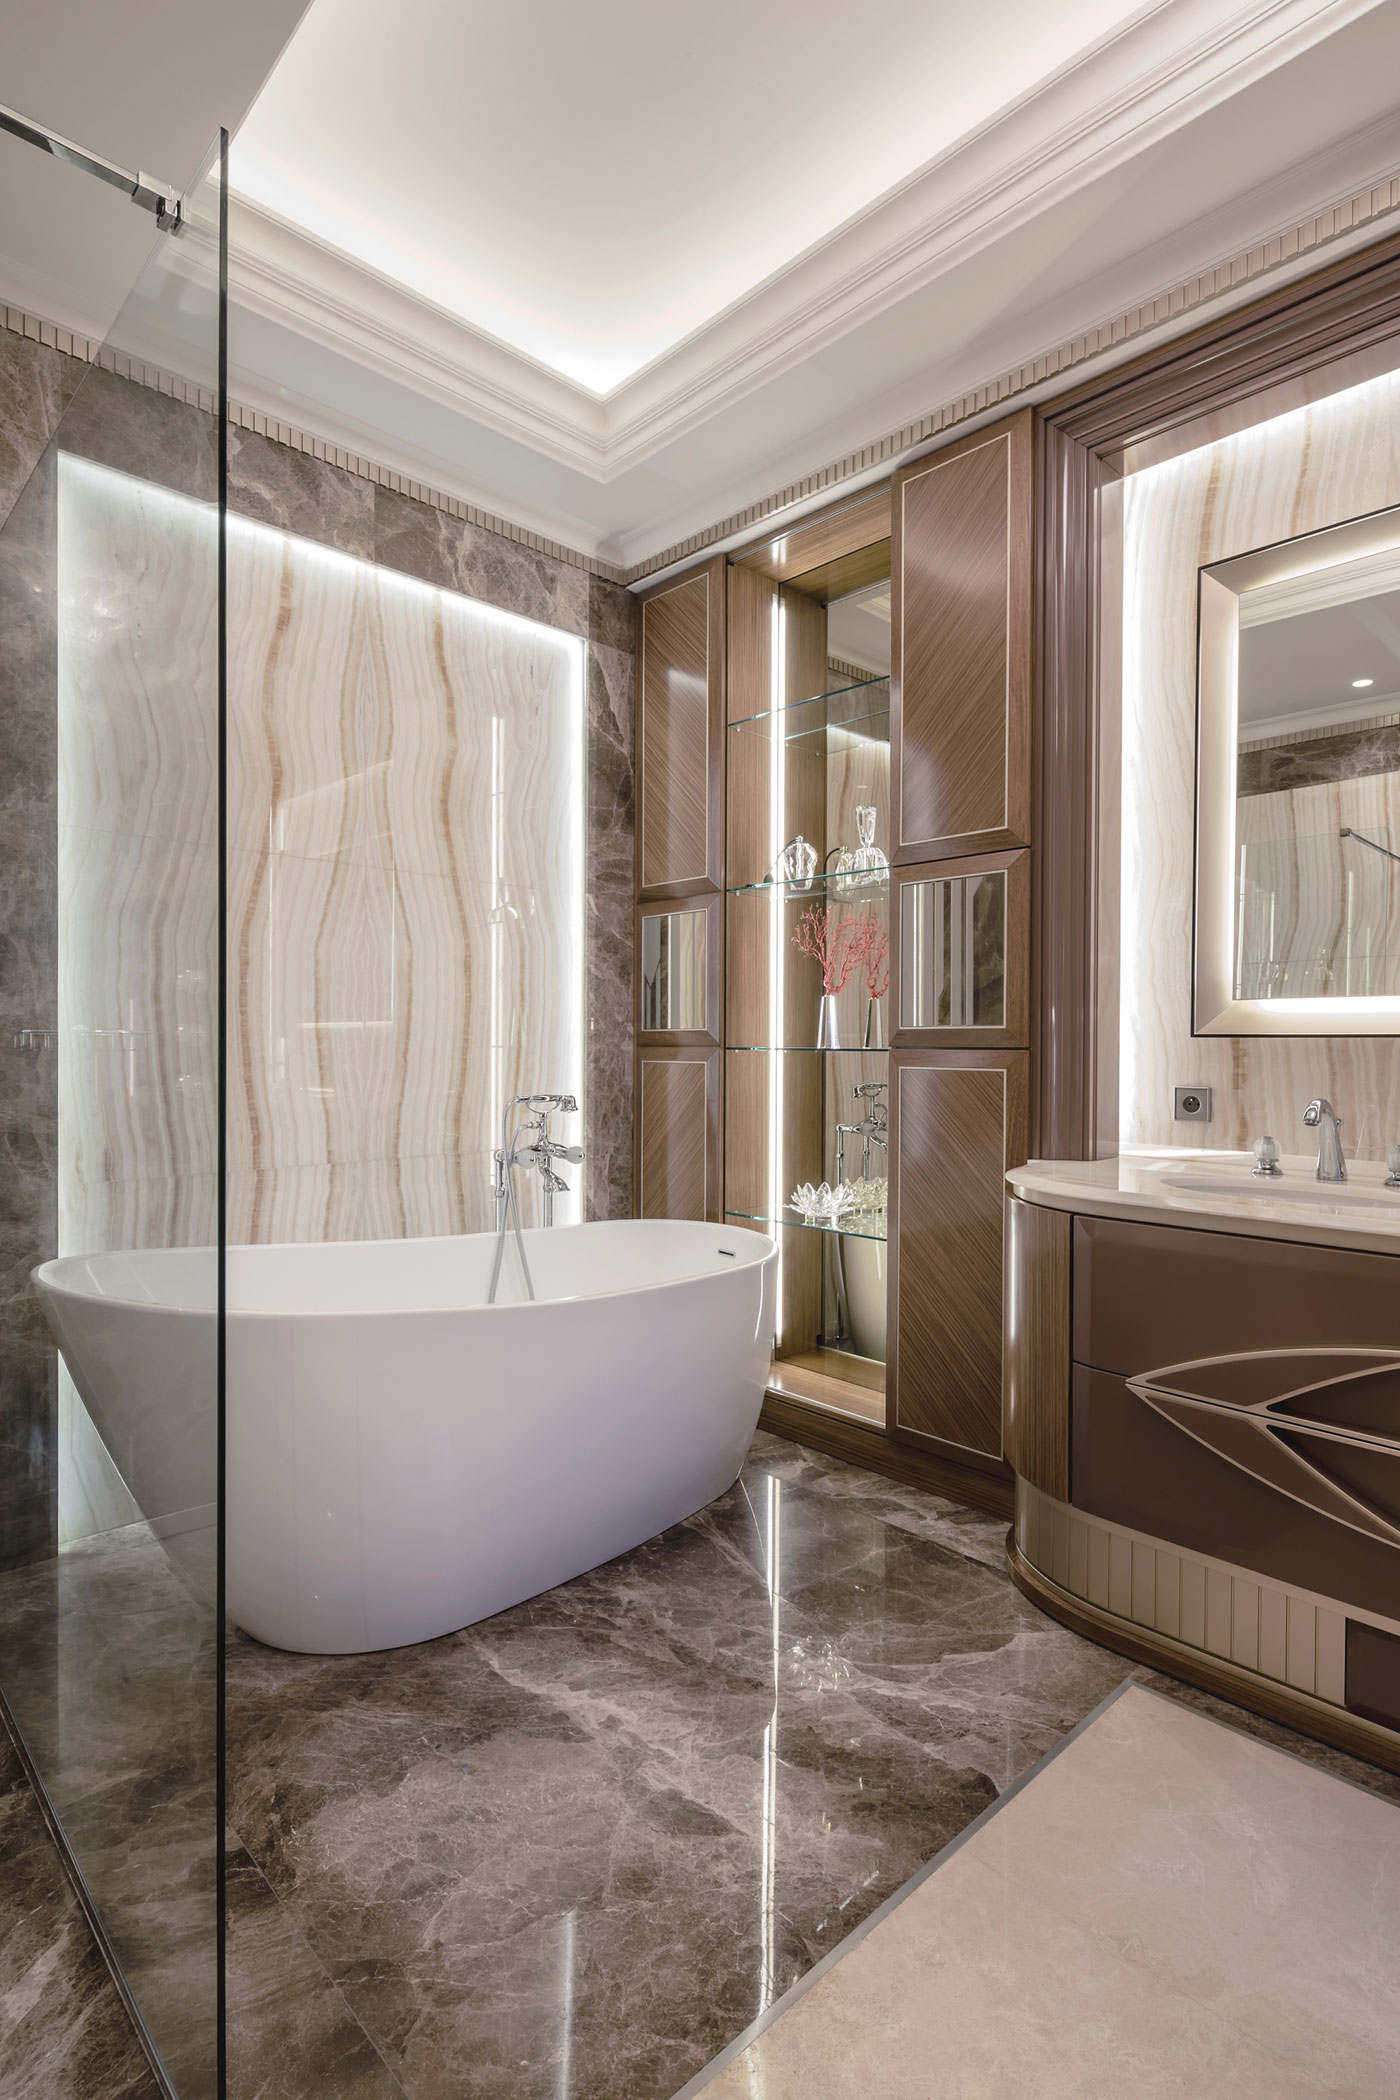 badkamer frans badkamer ontwerp idee n voor uw huis samen met meubels die het